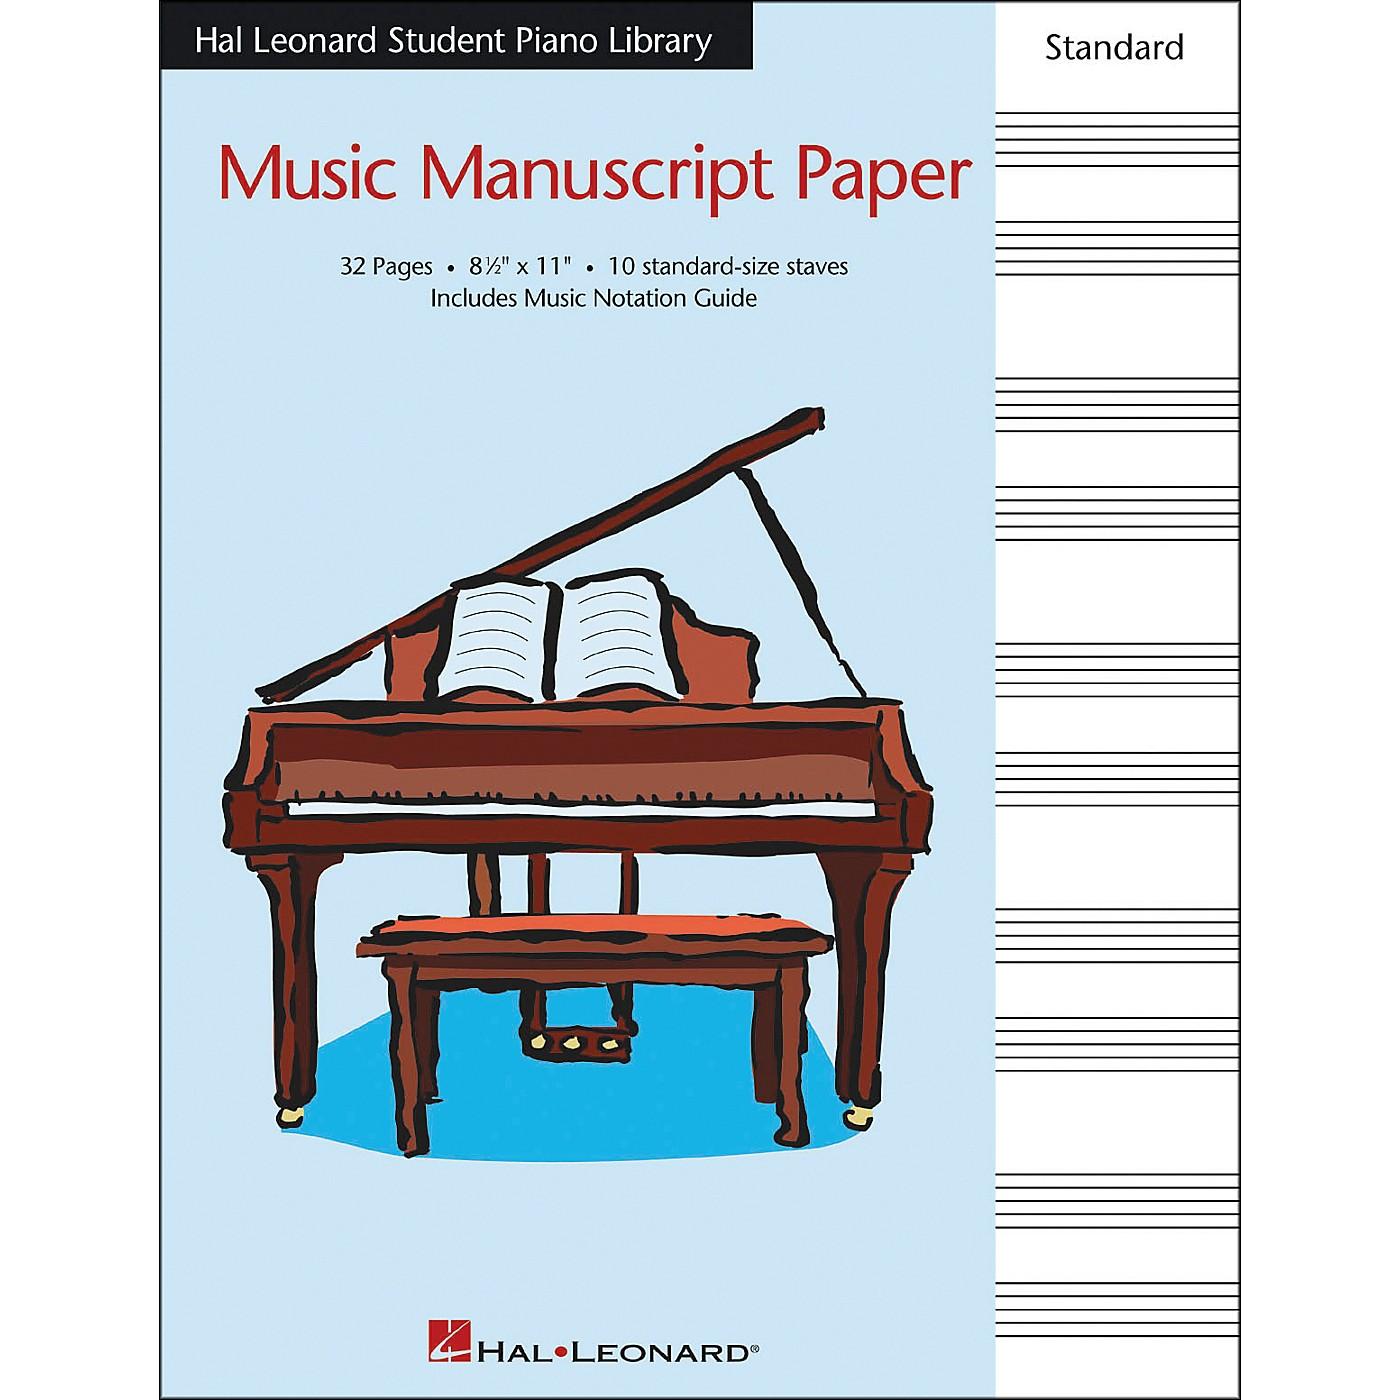 Hal Leonard Music Manuscript Paper Standard Size Staves 8.5 X 11 Hal Leonard Student Piano Library thumbnail